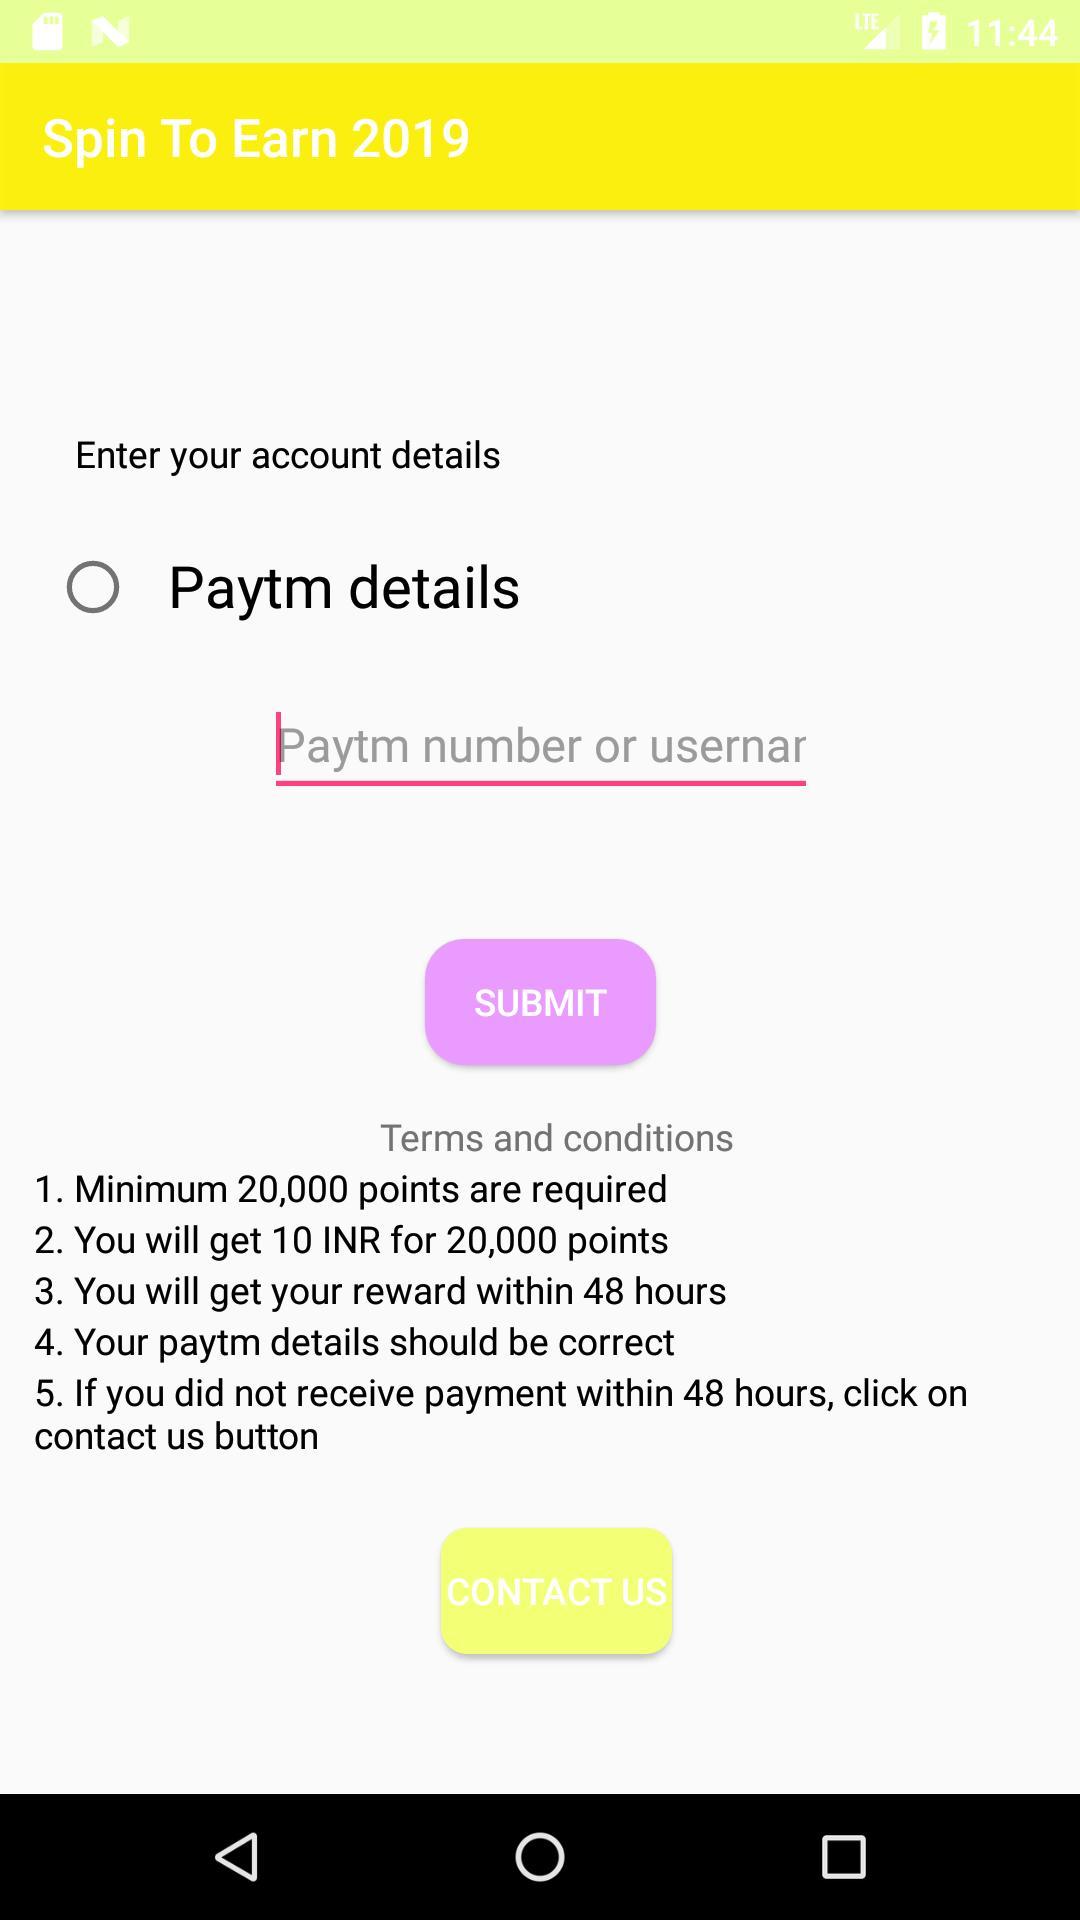 SpinToEarn 2019 - Earn Money Online Earning App for Android - APK